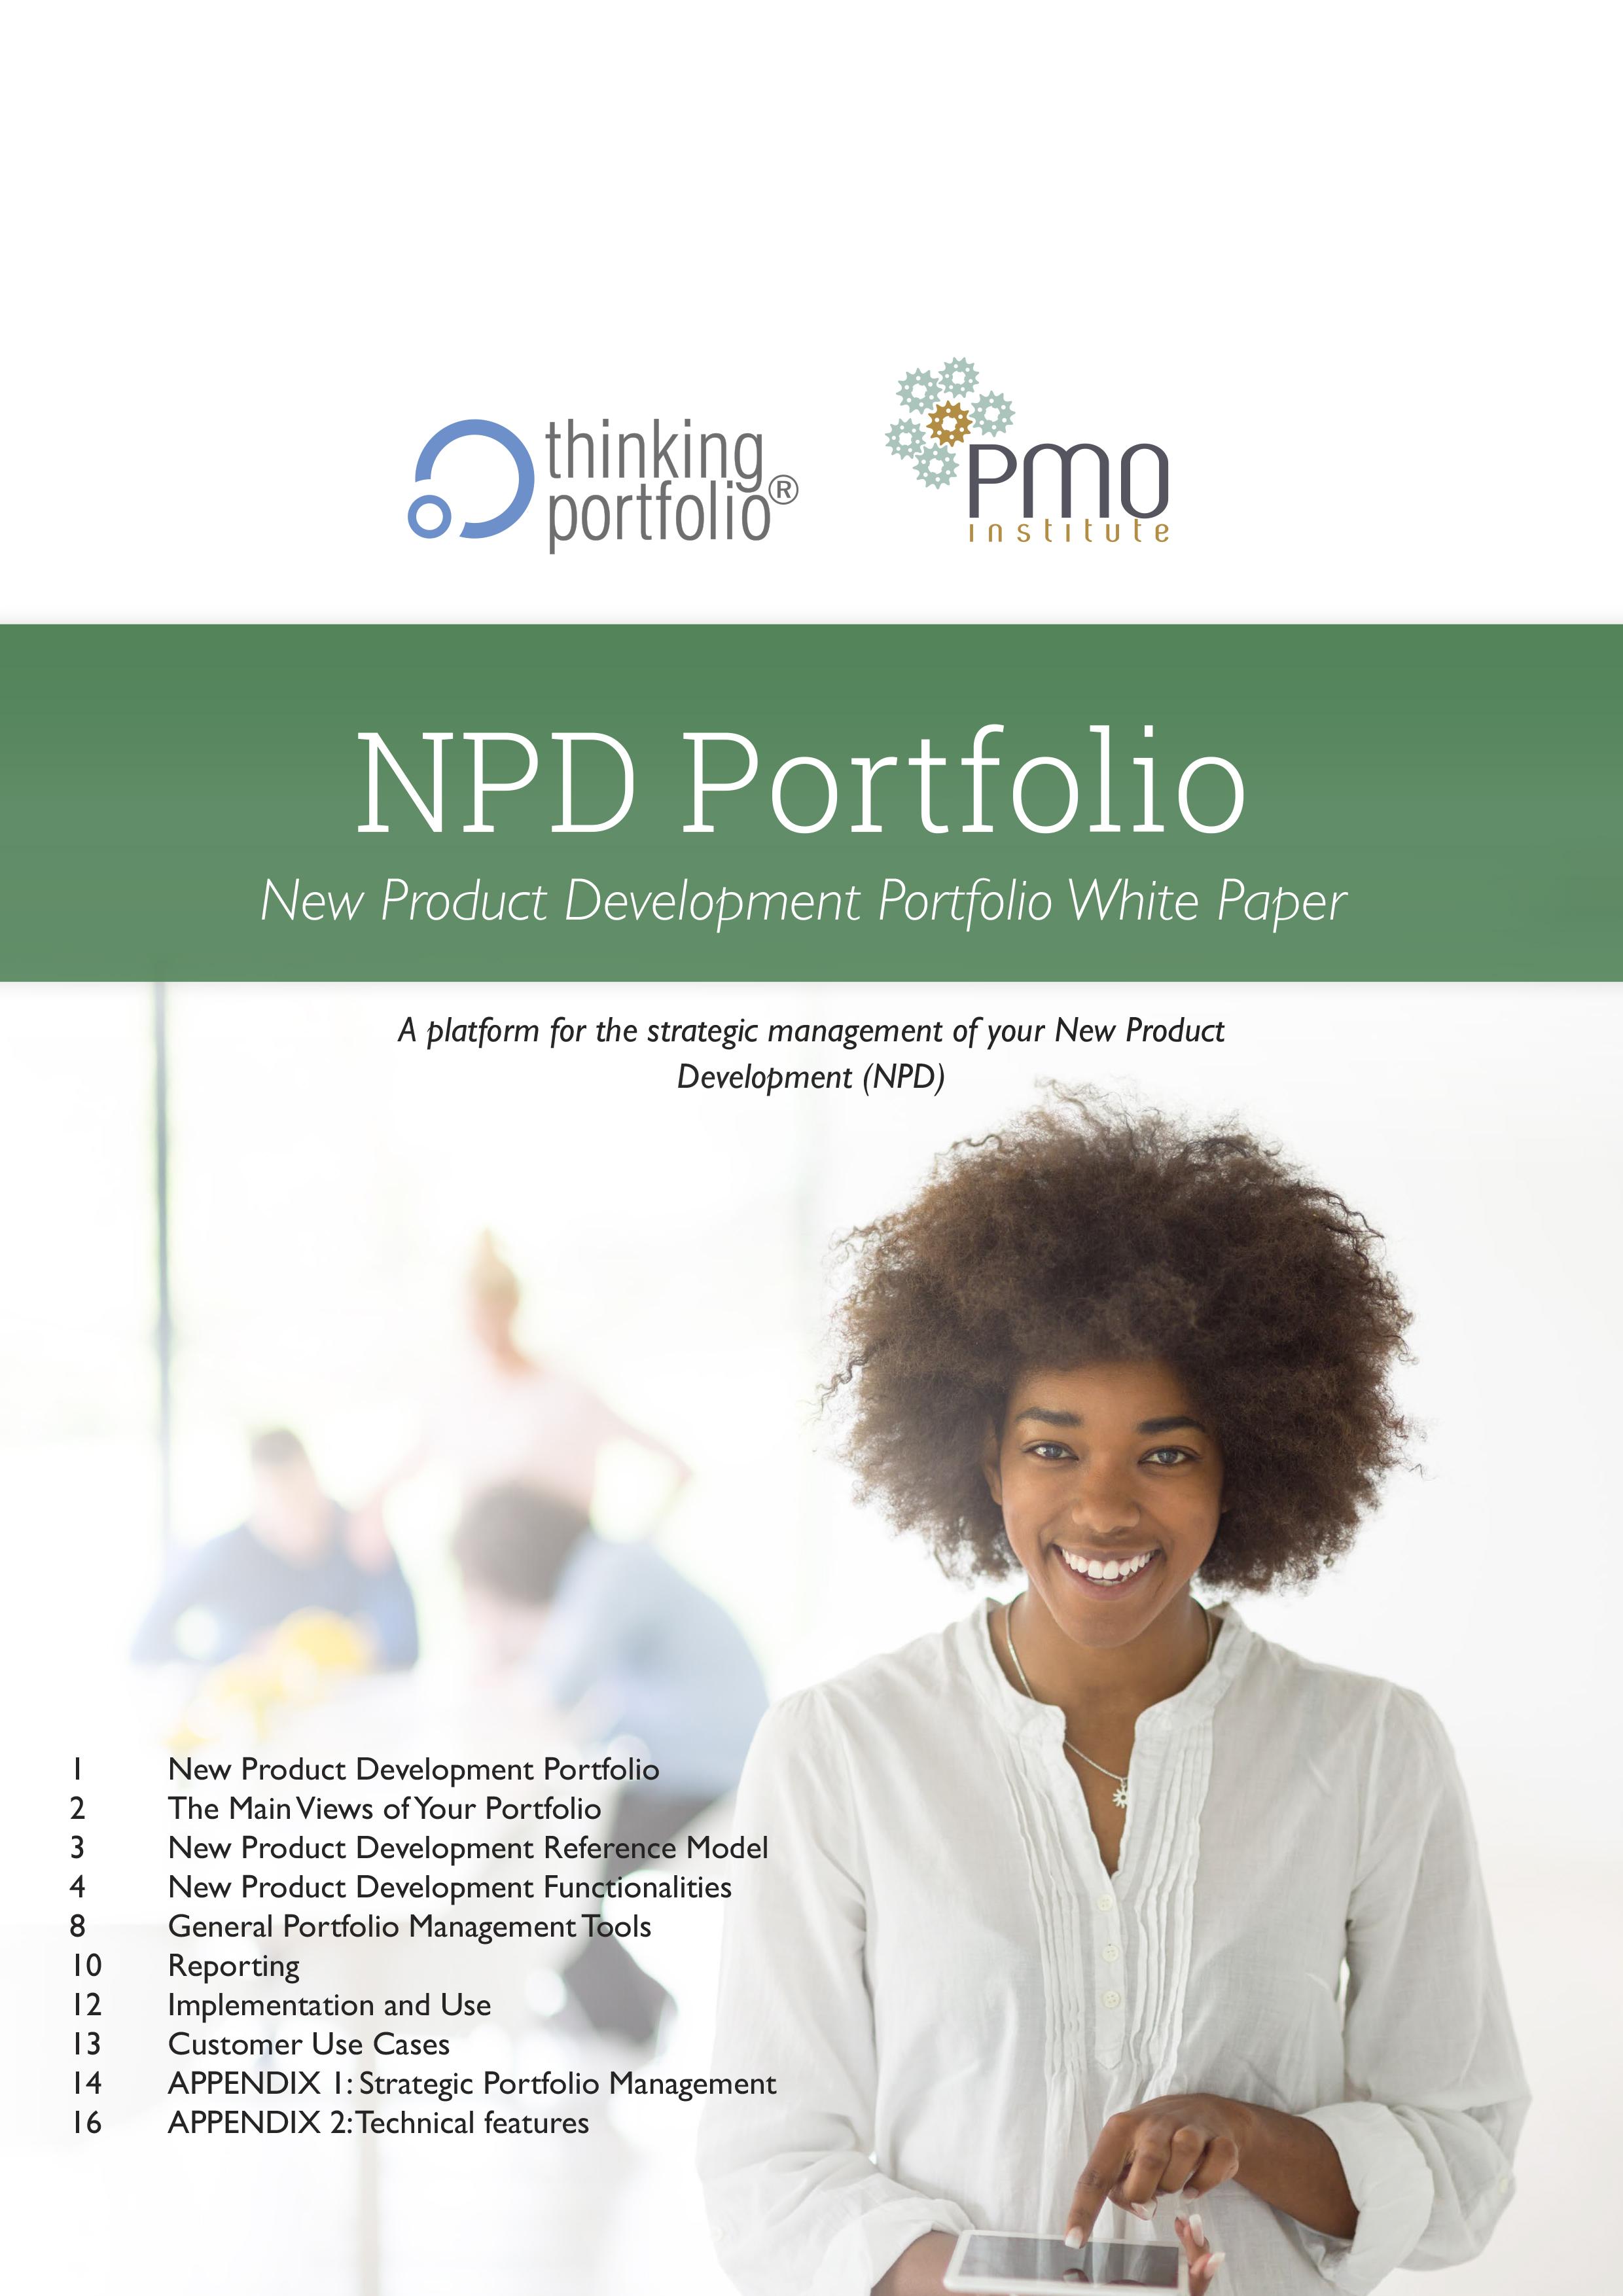 Thinking Portfolio NPD Portfolio